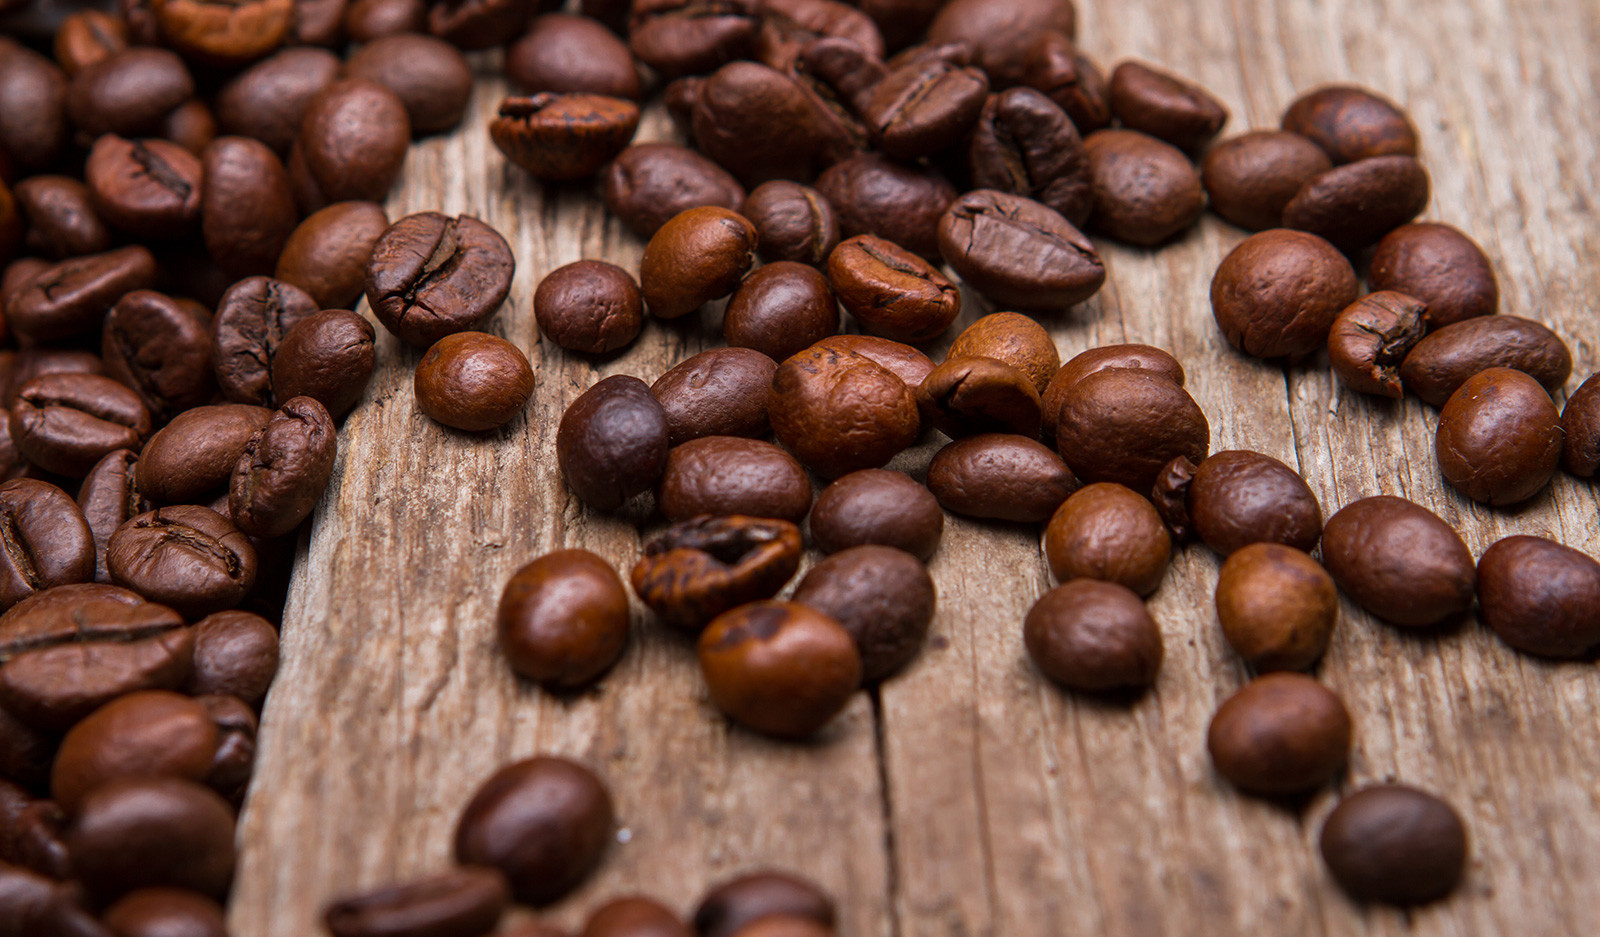 Coffee beans spread across table.